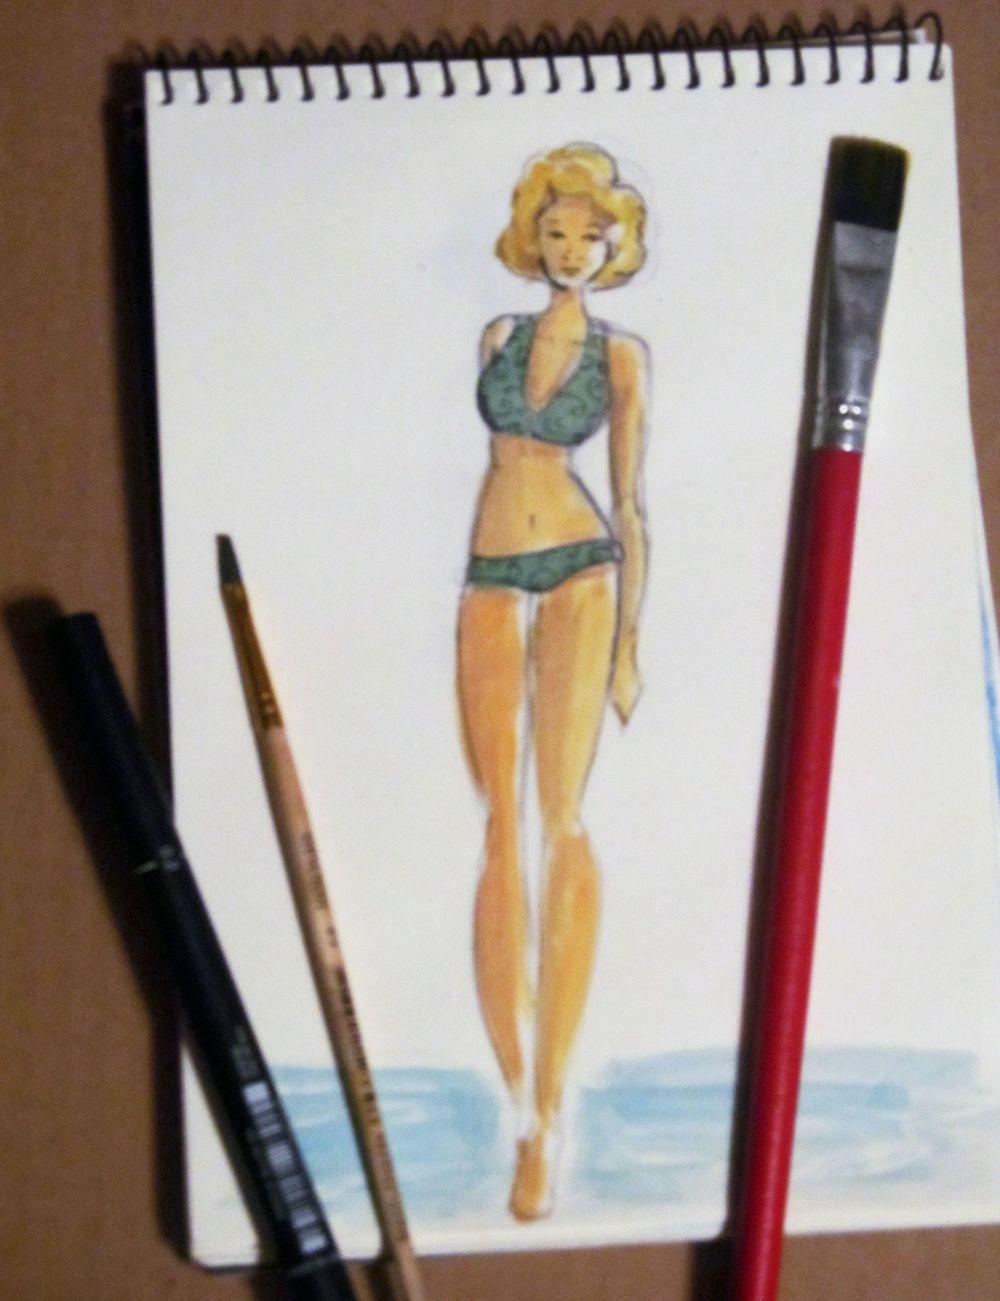 Swimwear Fashion Illustrations - image 3 - student project